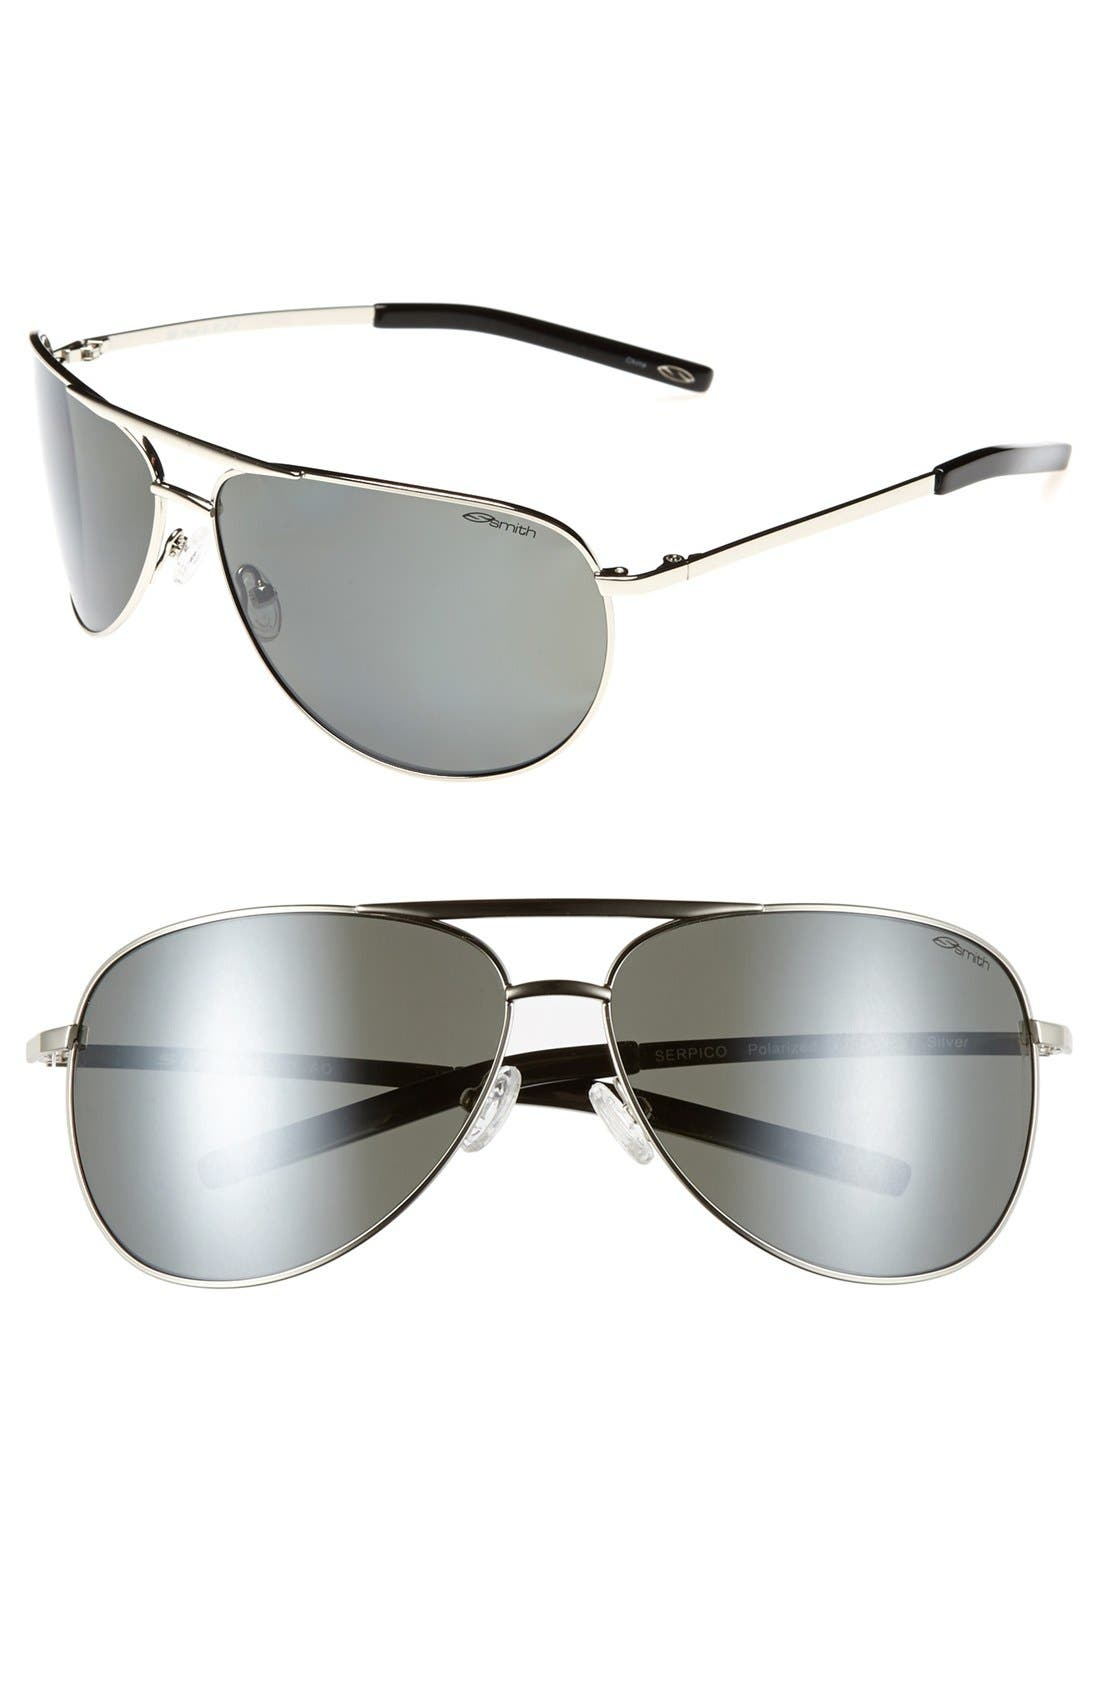 Alternate Image 1 Selected - Smith Serpico 65mm Polarized Aviator Sunglasses